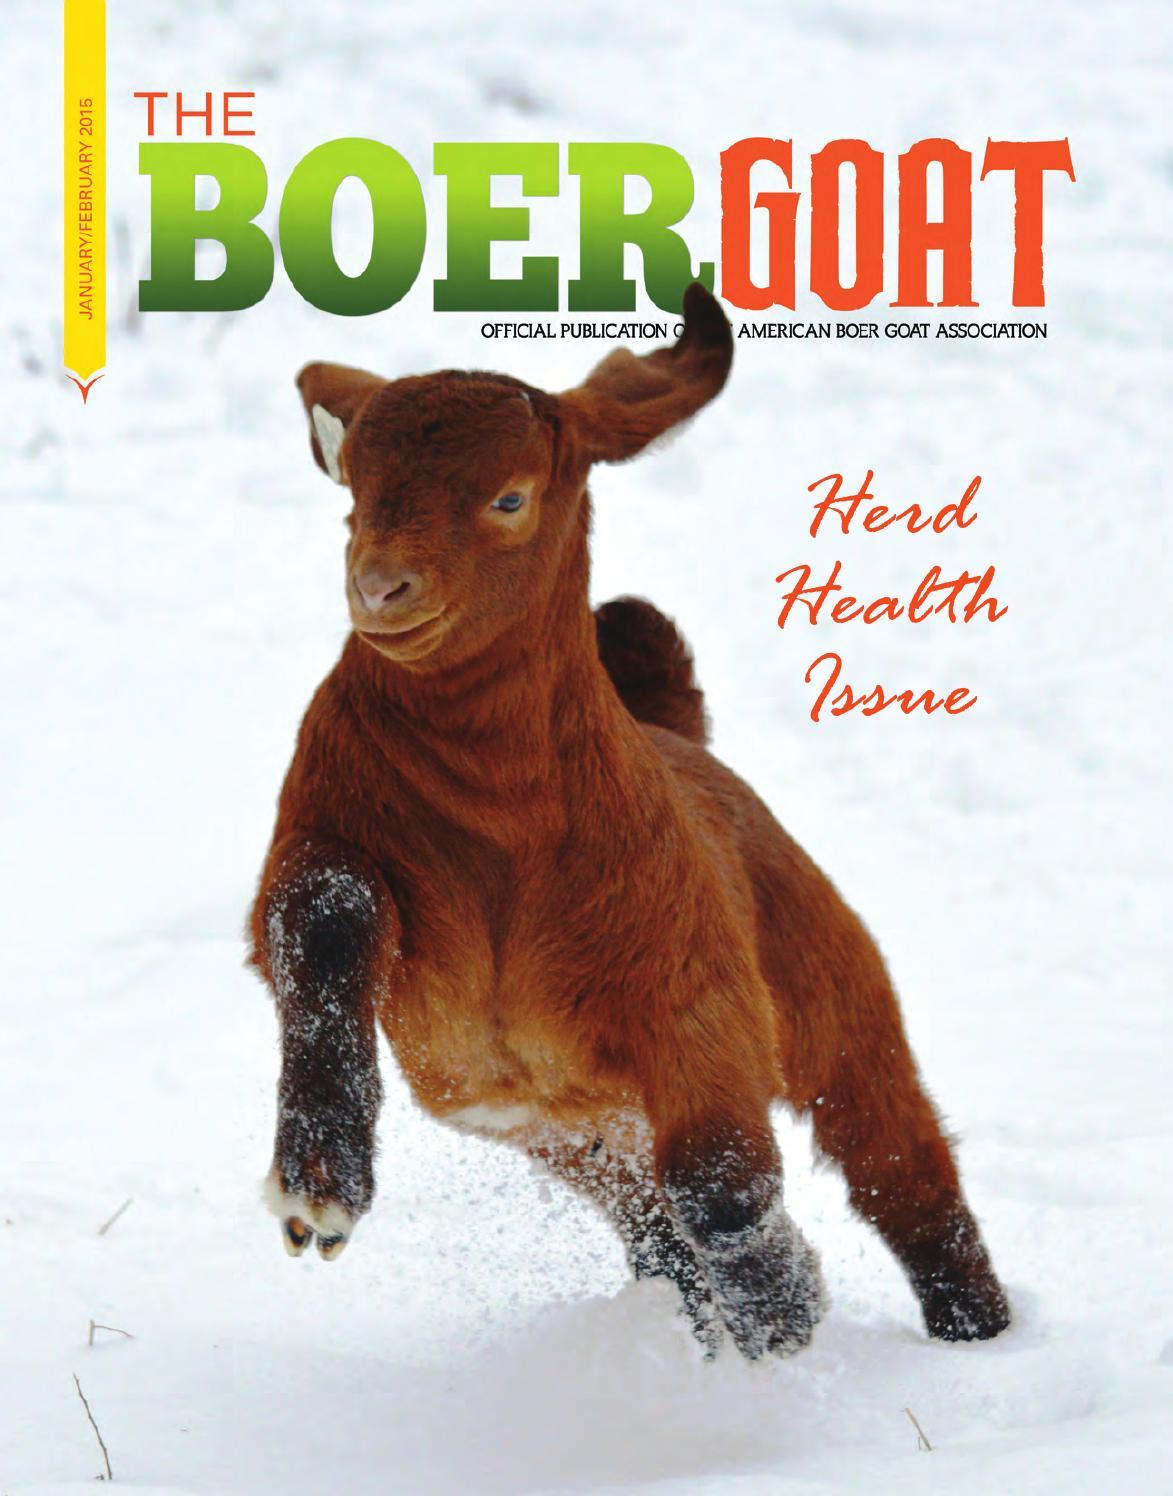 The Boer Goat January/February 2015 by American Boer Goat ... - photo#29